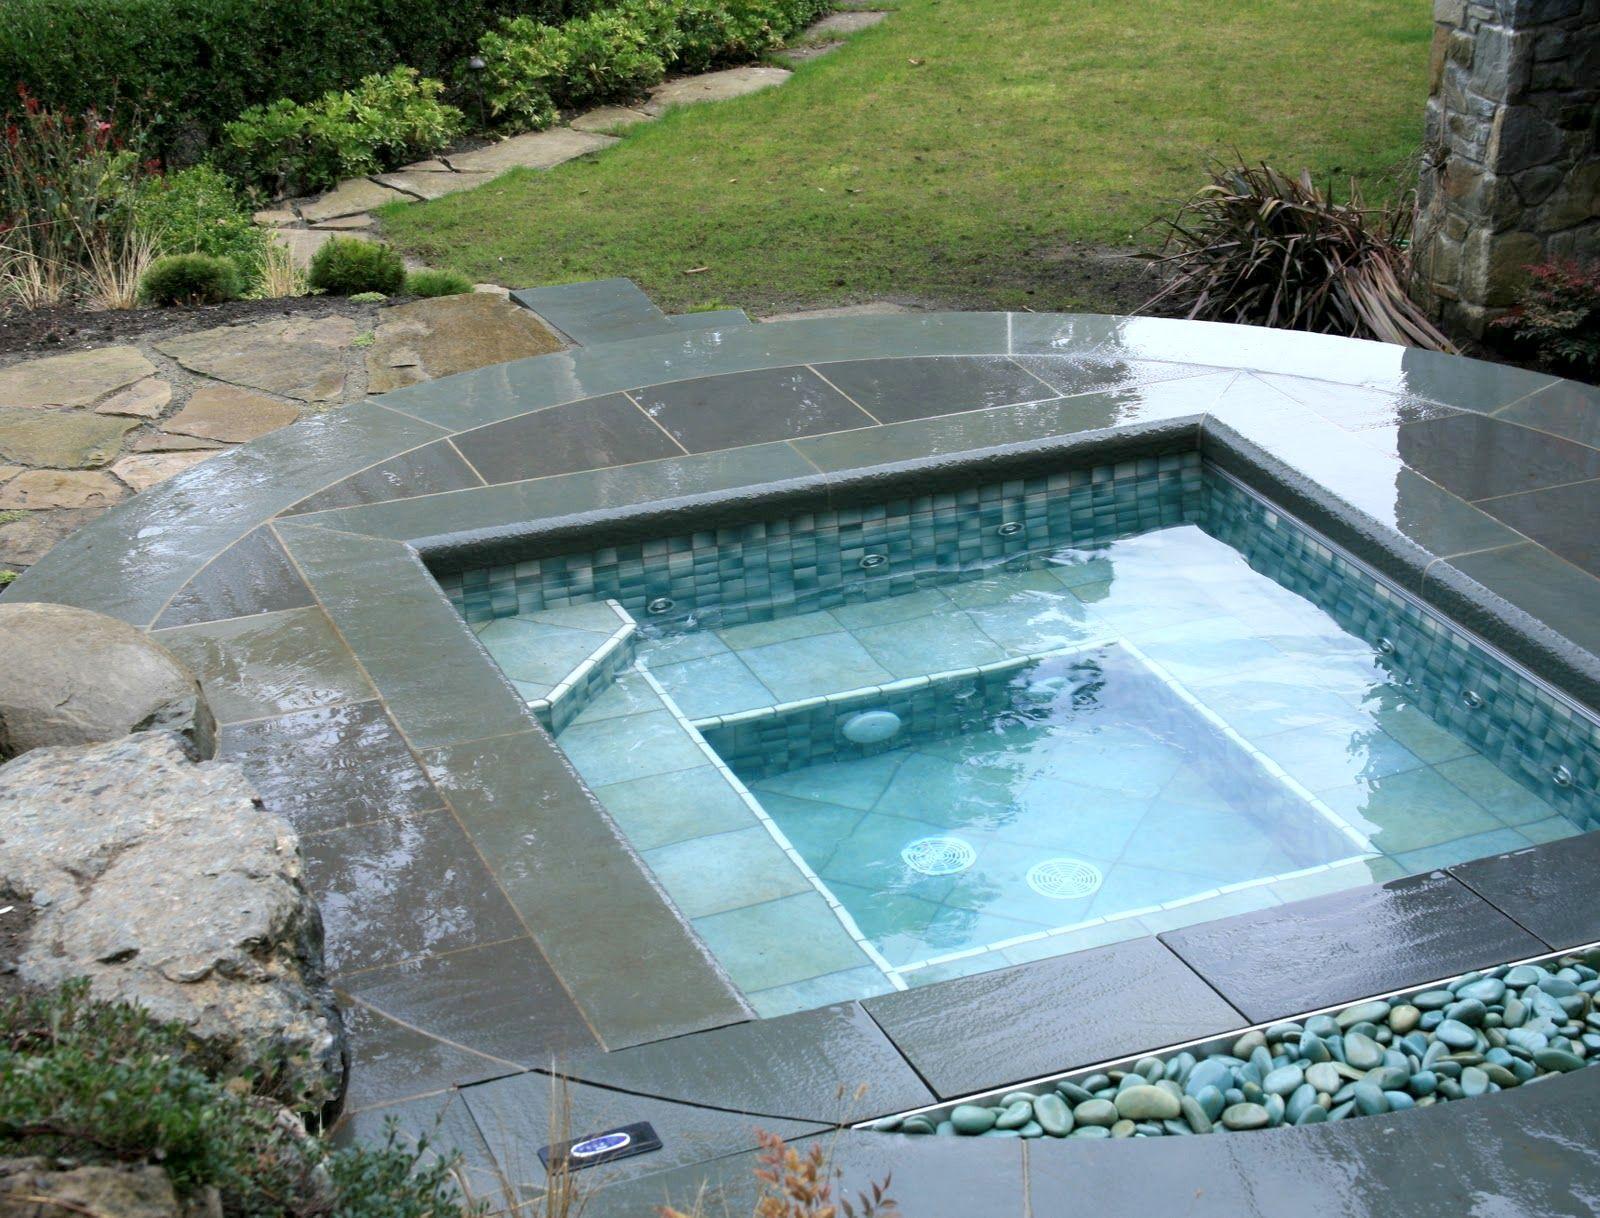 30 Awesome Hot Tub Enclosure Ideas For Your Backyard Sunken Hot Tub Hot Tub Garden Inground Hot Tub